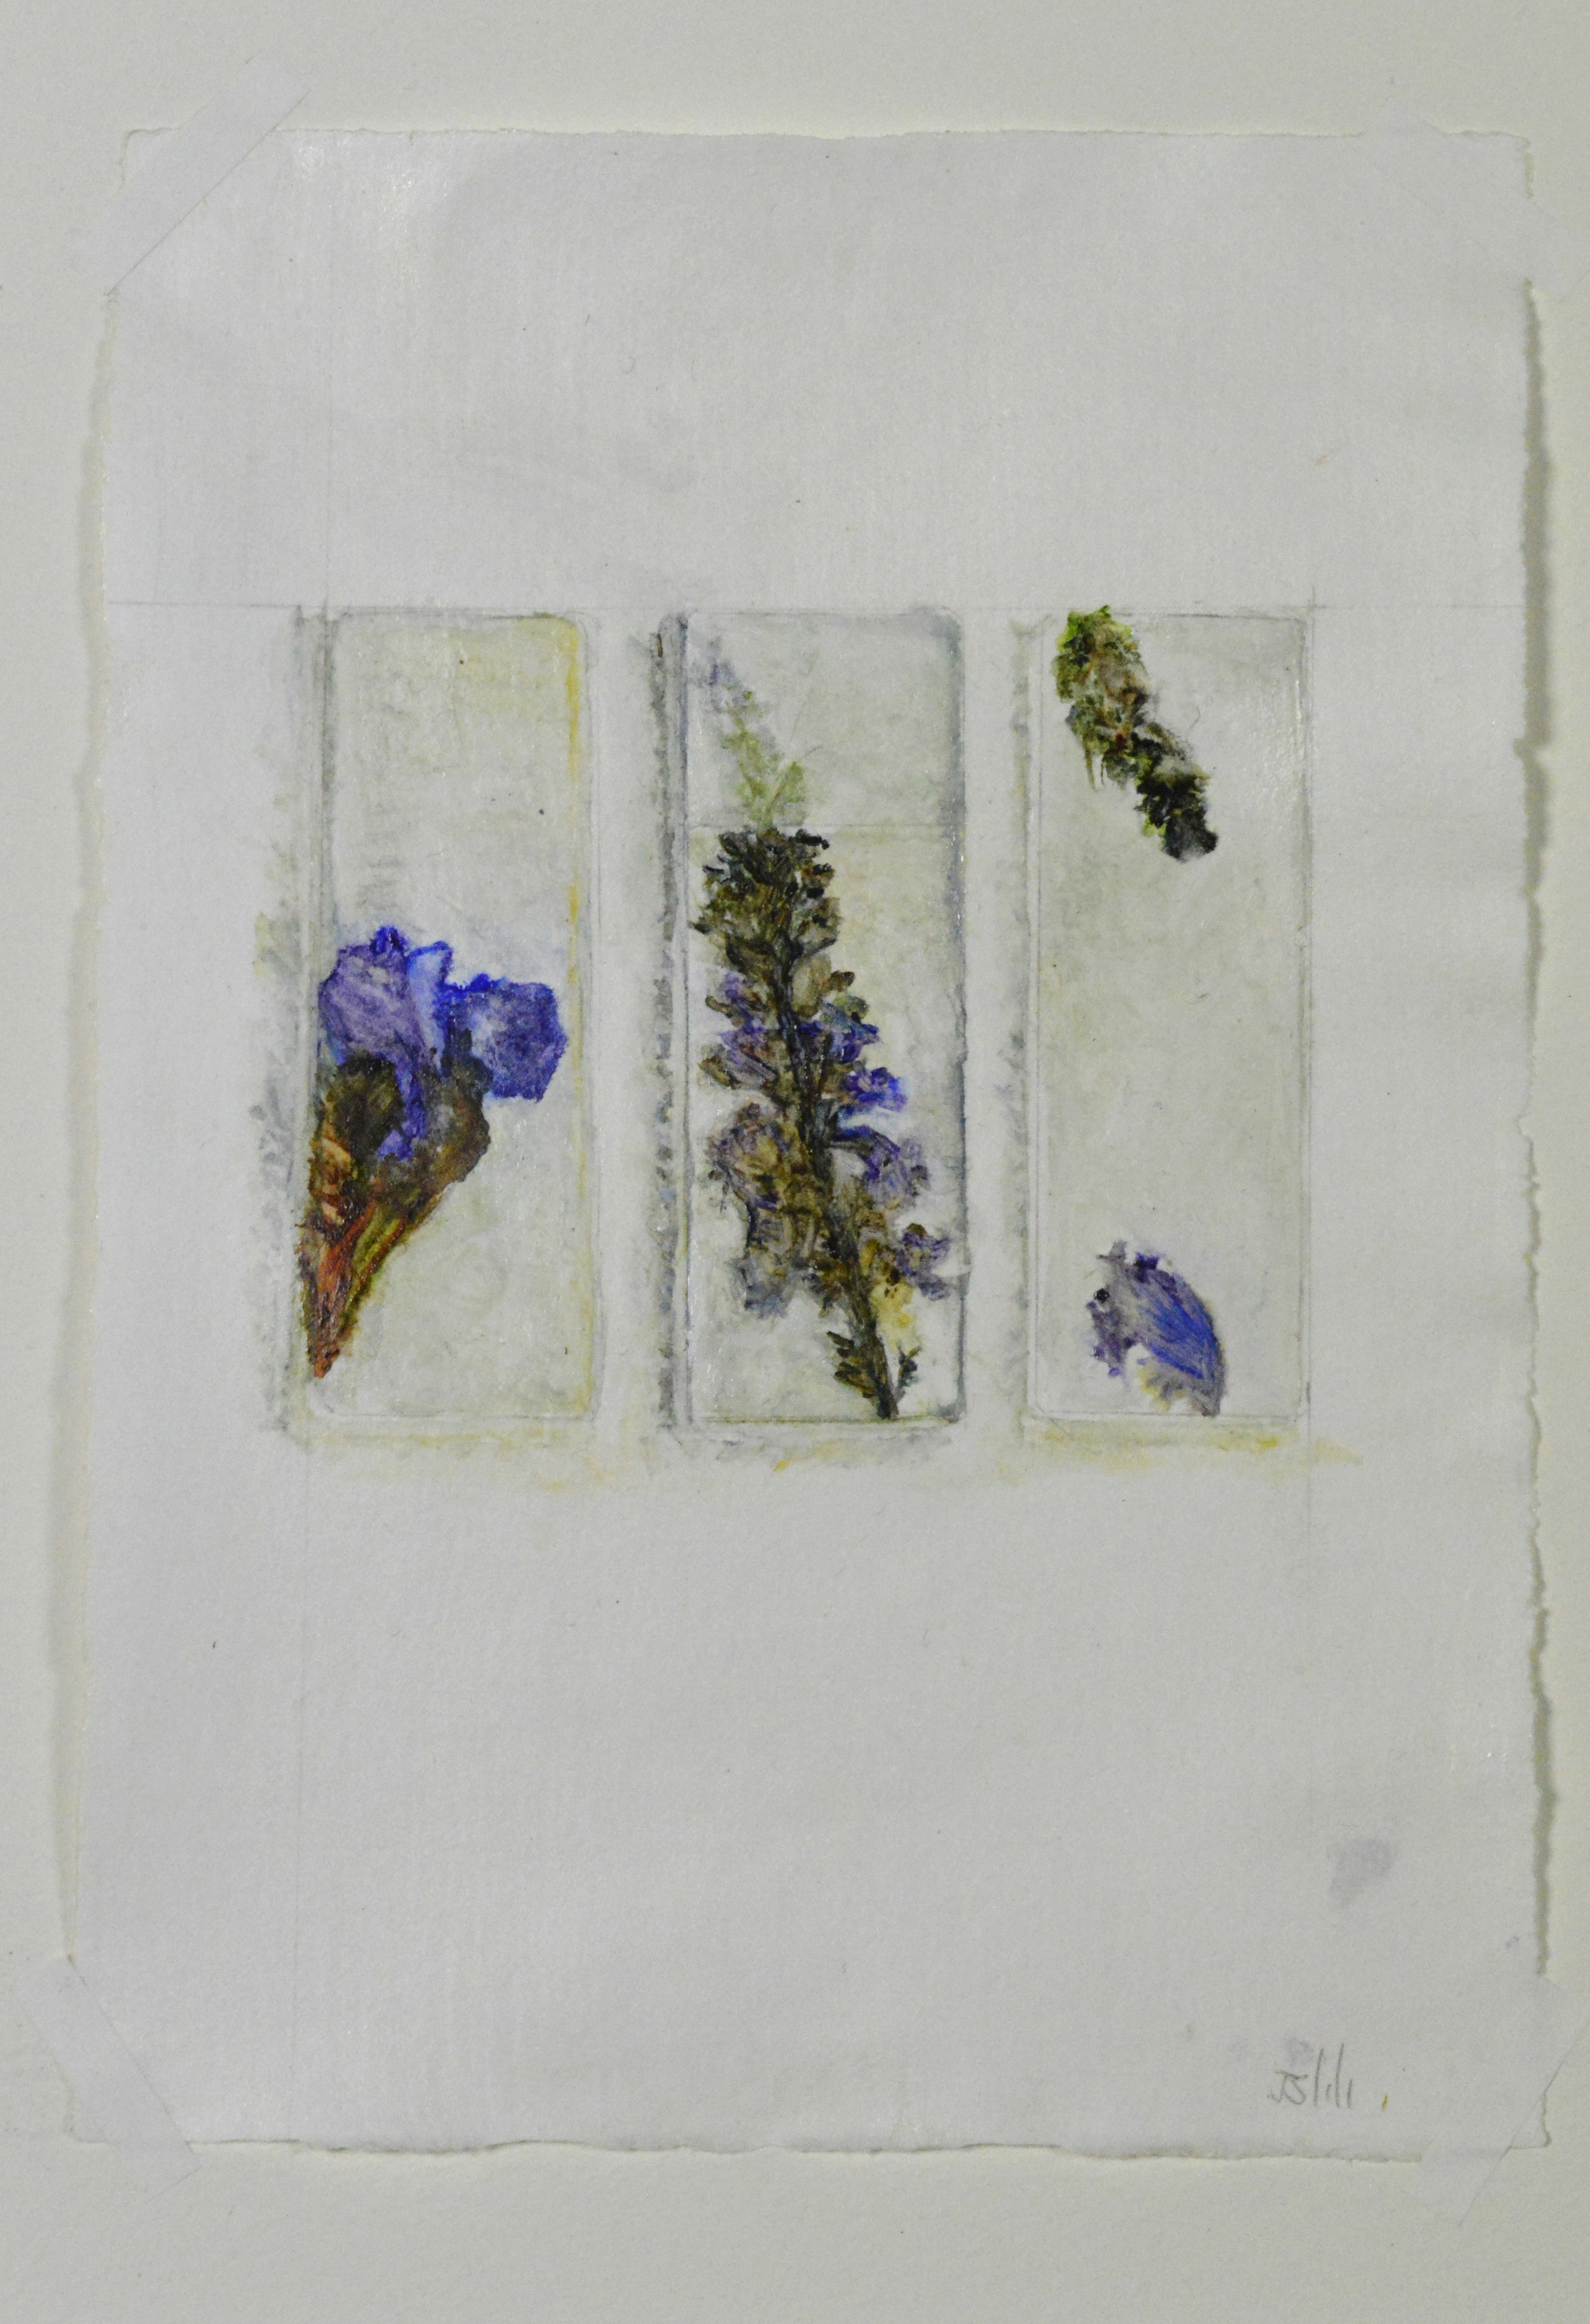 Anthophora furcata, fork tailed flower bee, habitat